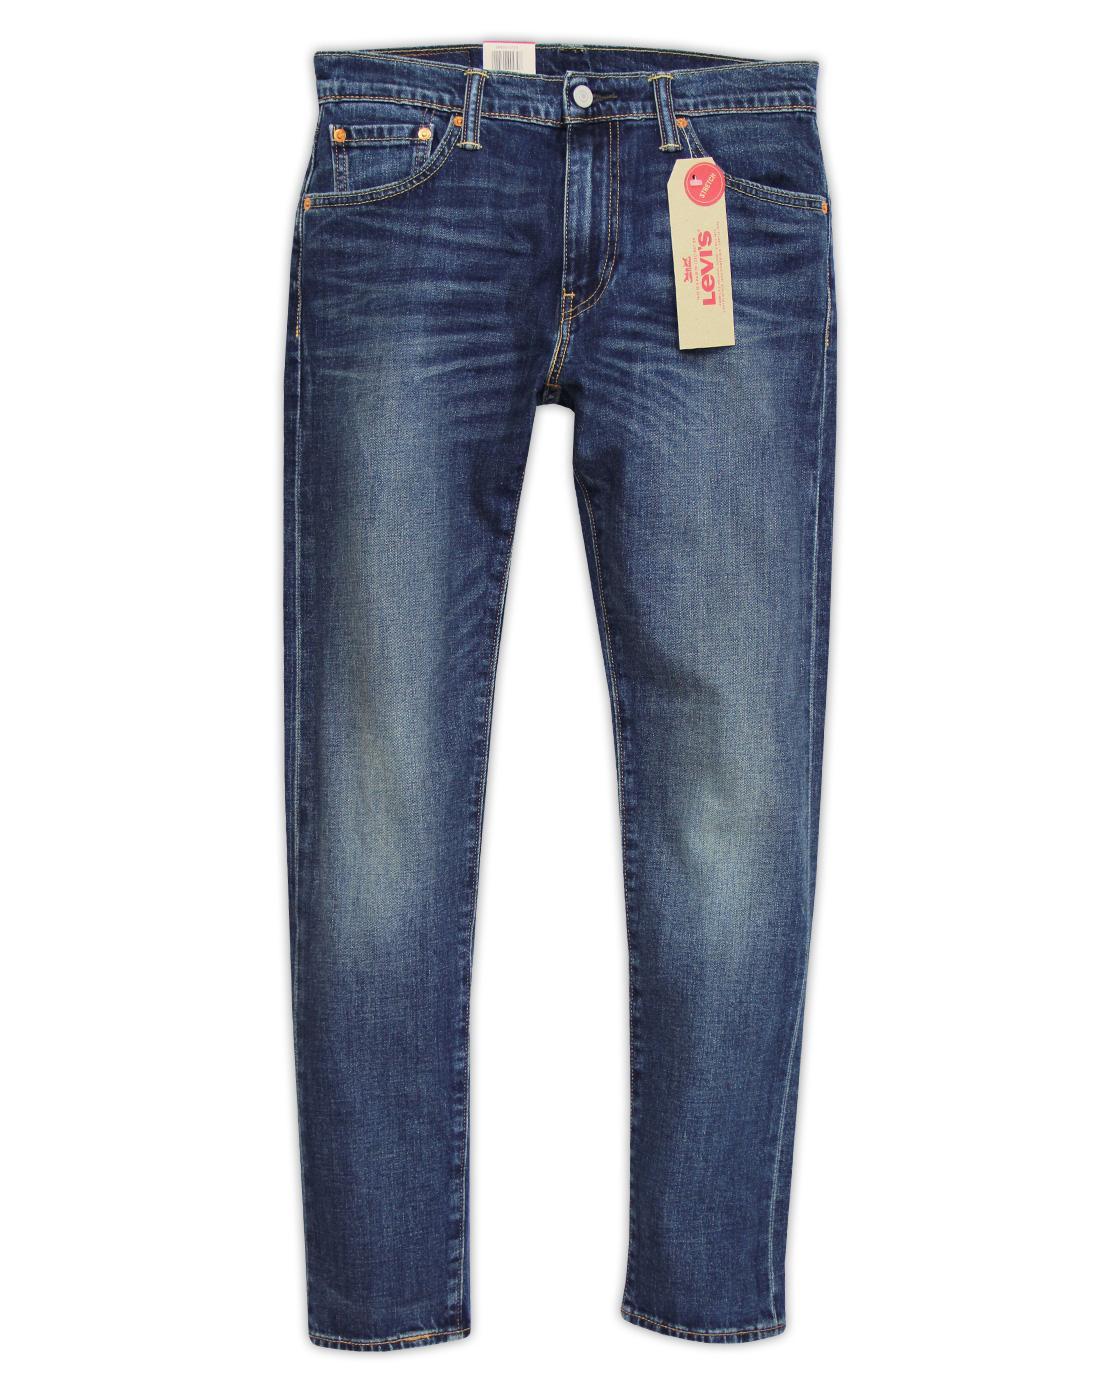 LEVI'S 512 Madison Square Slim Taper Fit Jeans